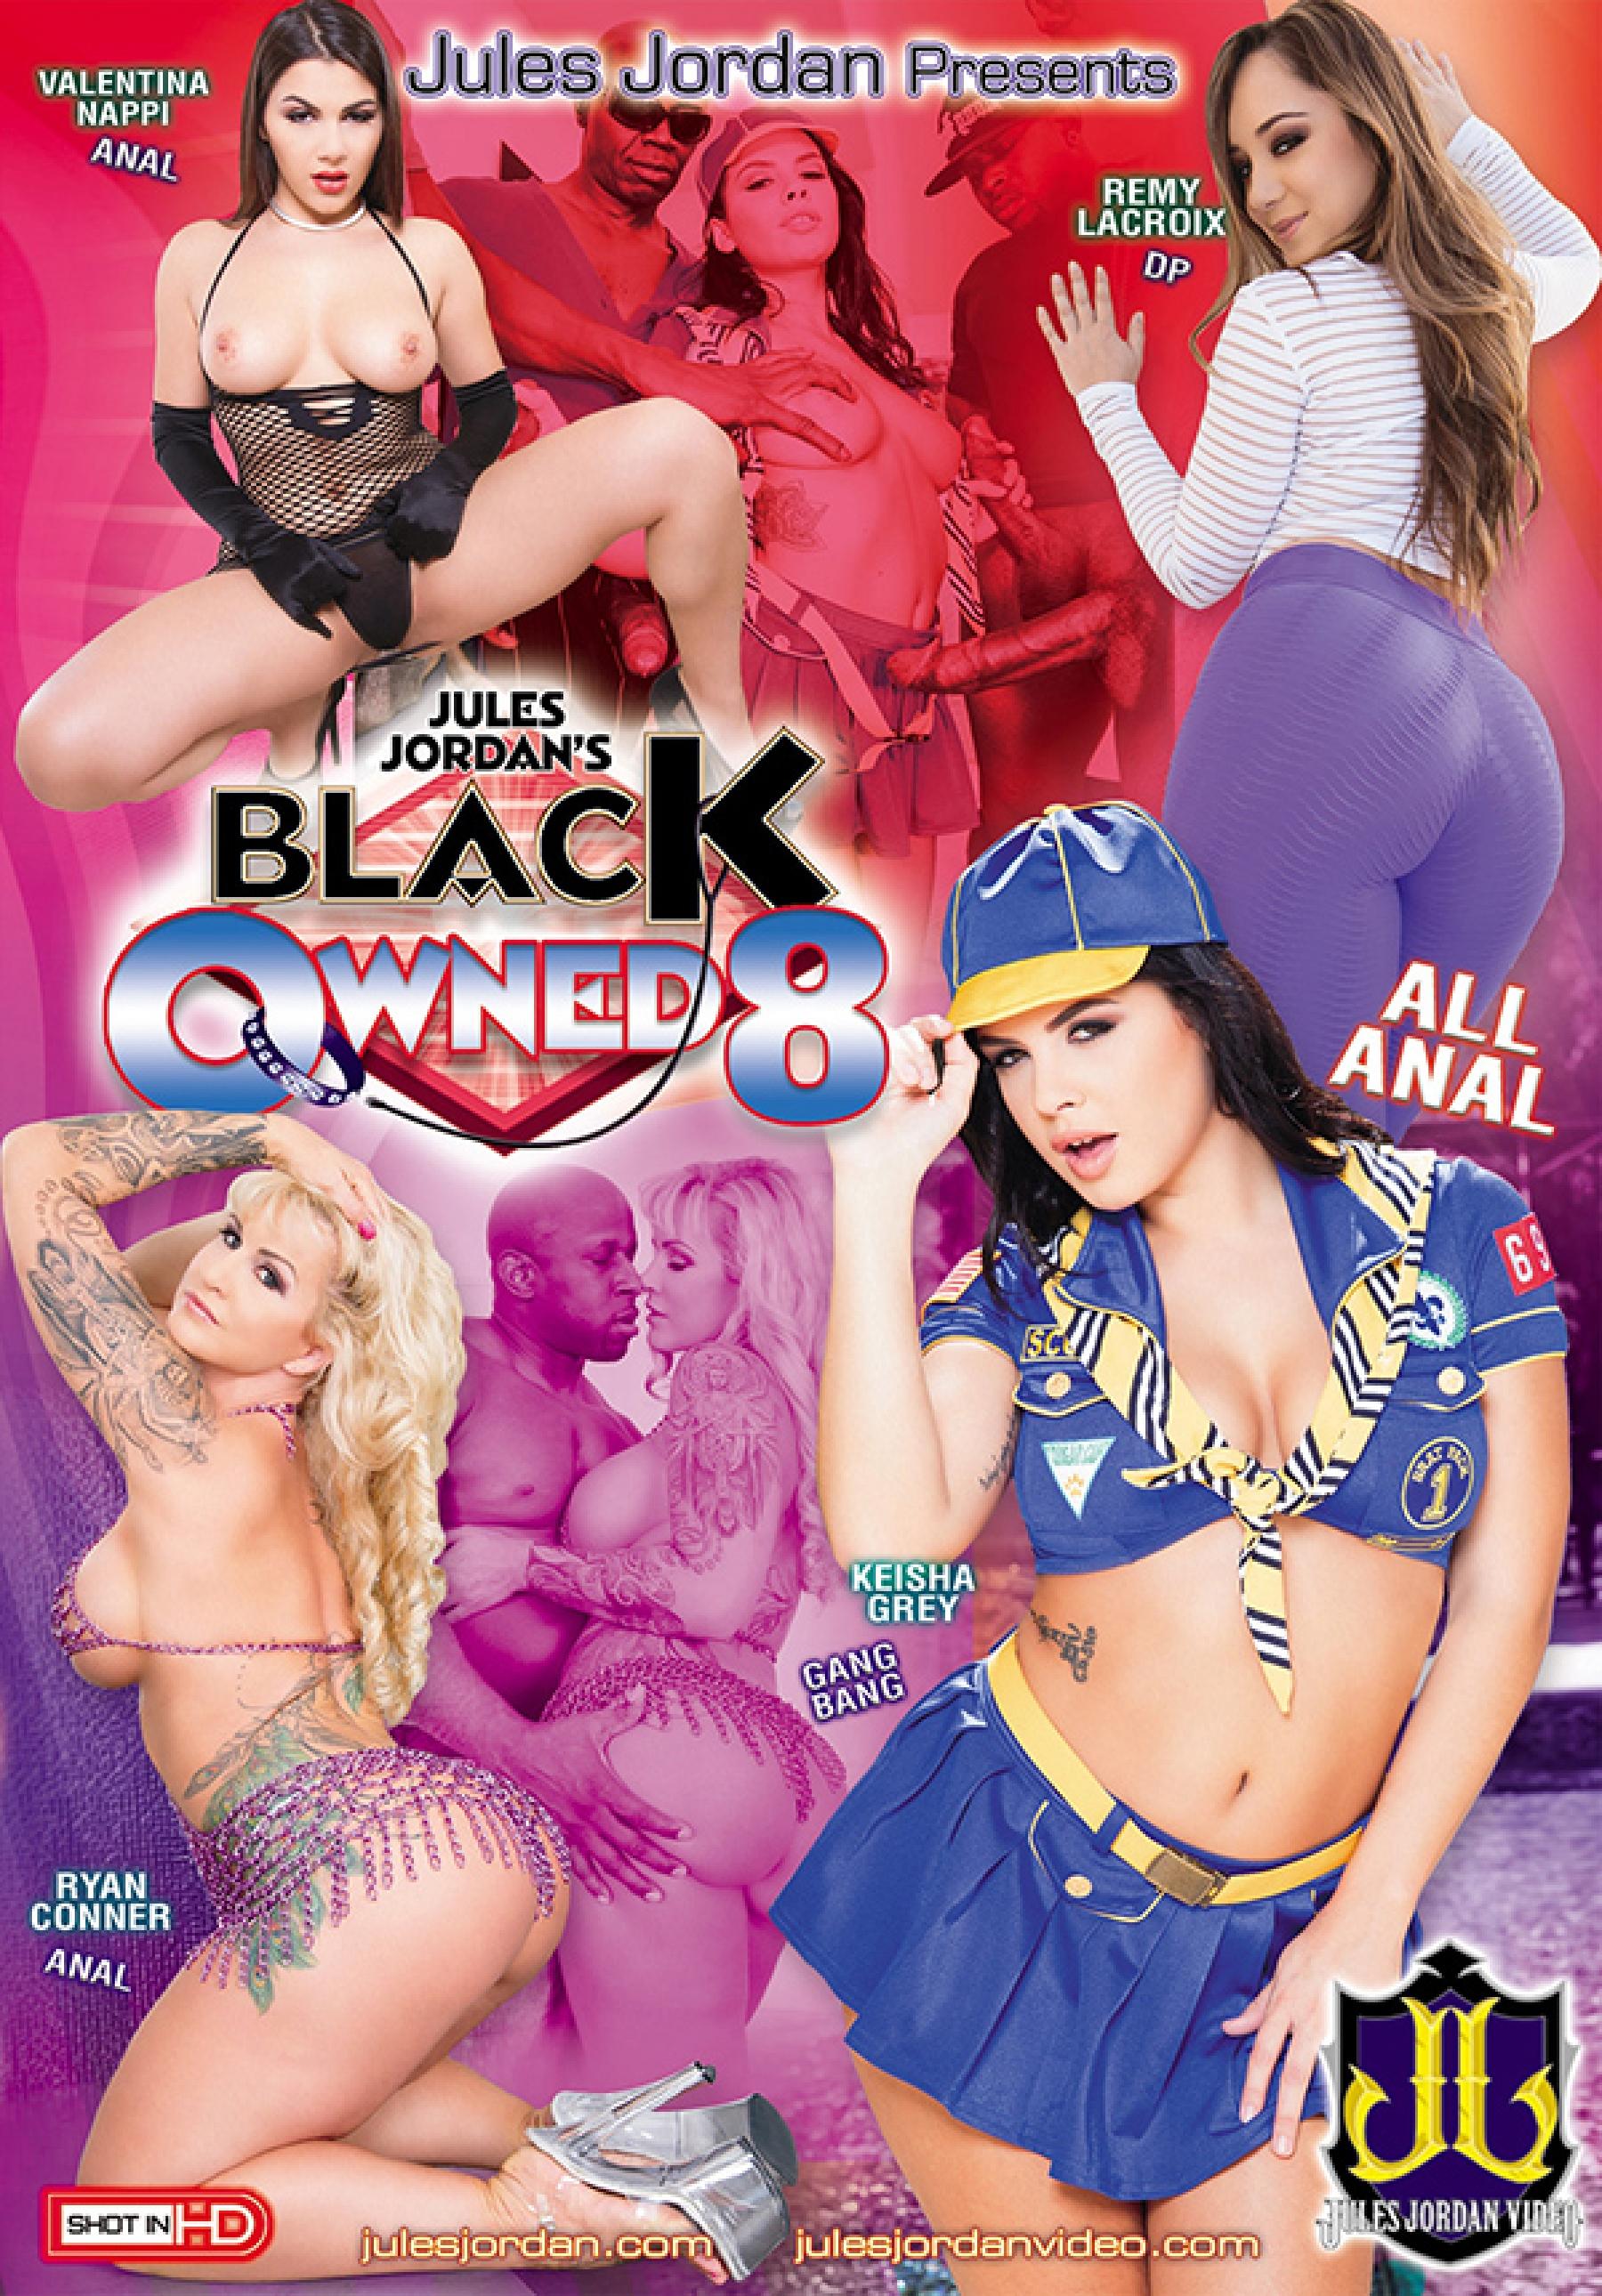 4K Perfect Body Porn Black black owned #8 porn videos jules jordan's official pornstar site